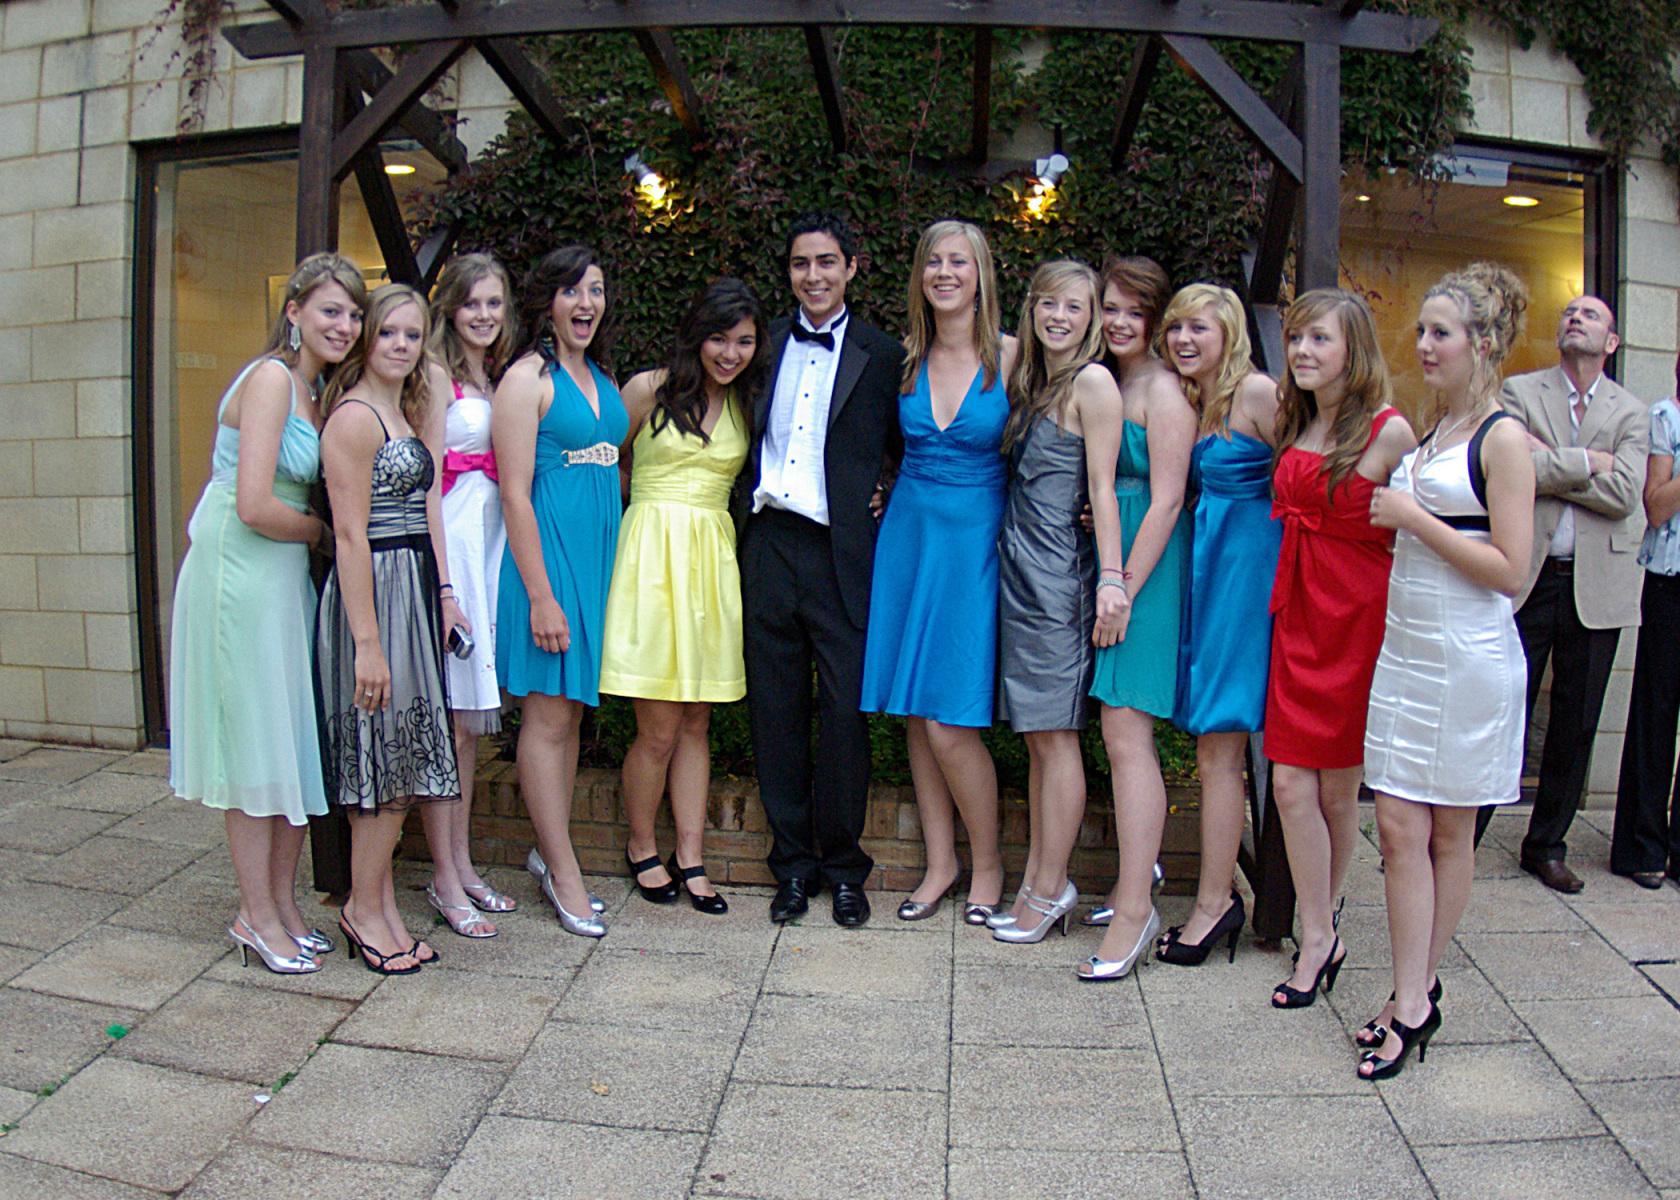 Prom-King-Sandra-Sergeant-Schools-Nursery-Photographer-Basingstoke